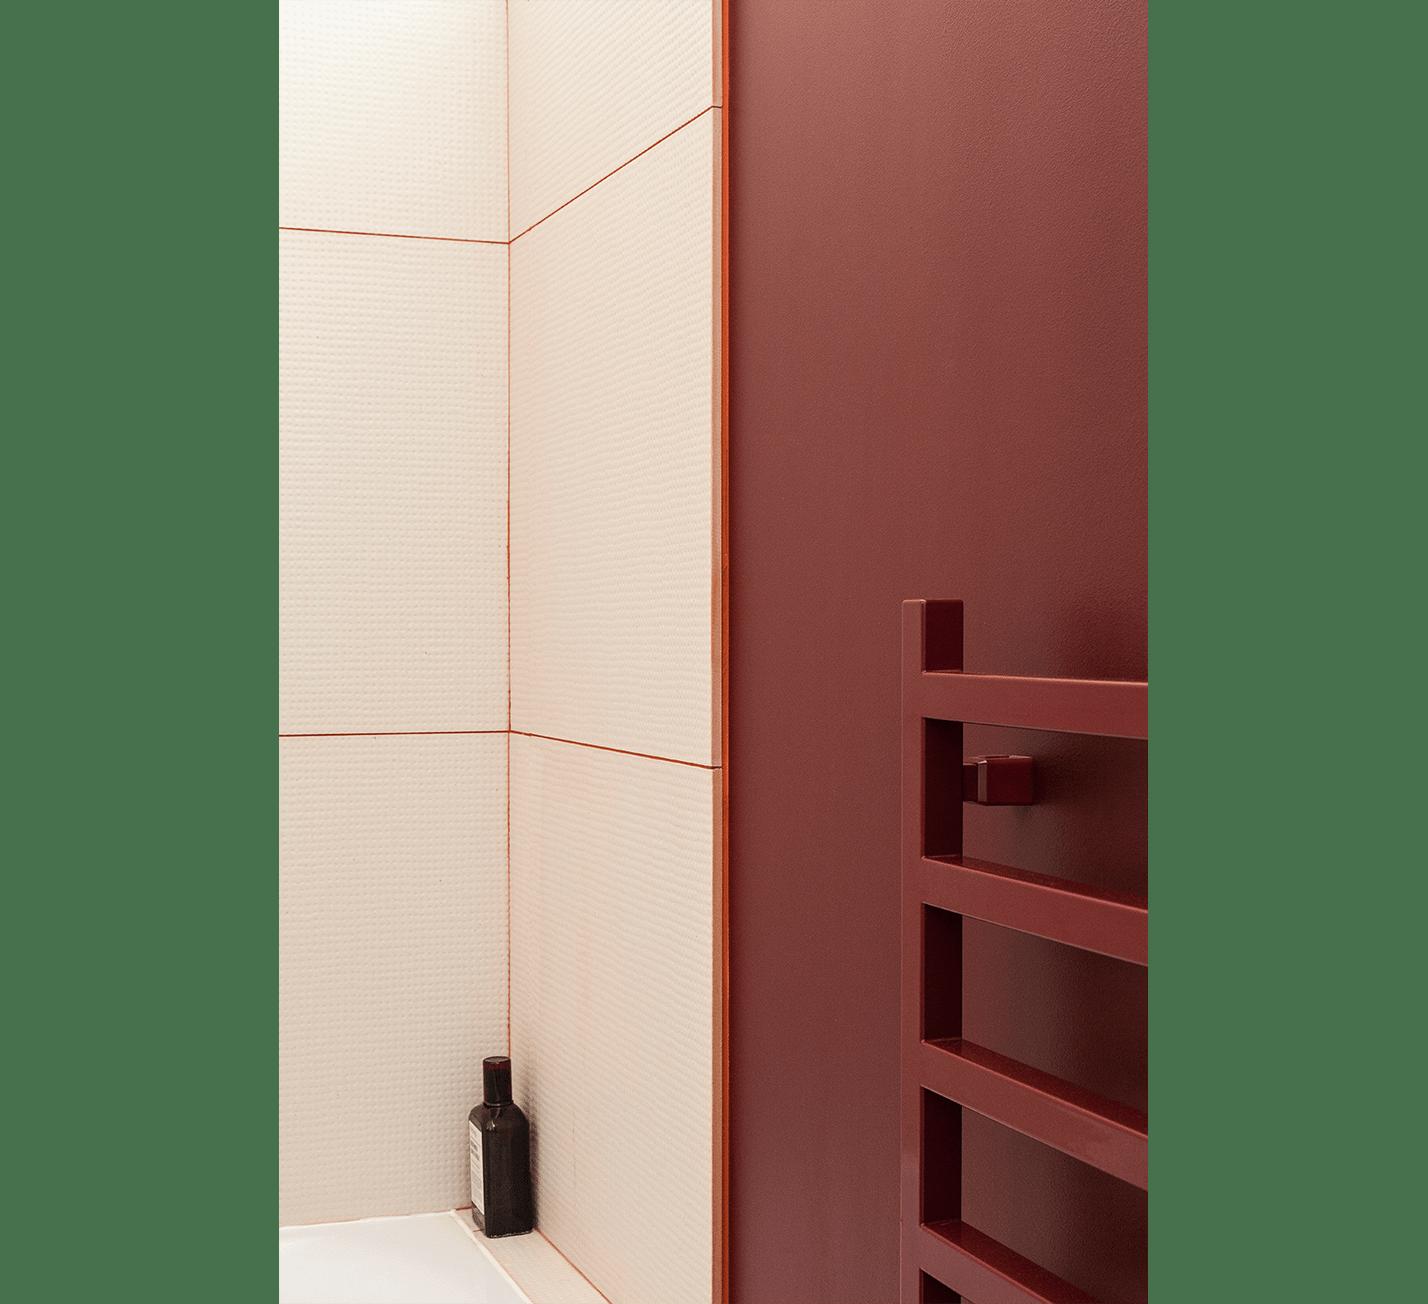 Projet-Alfred-Atelier-Steve-Pauline-Borgia-Architecture-interieur-10-min